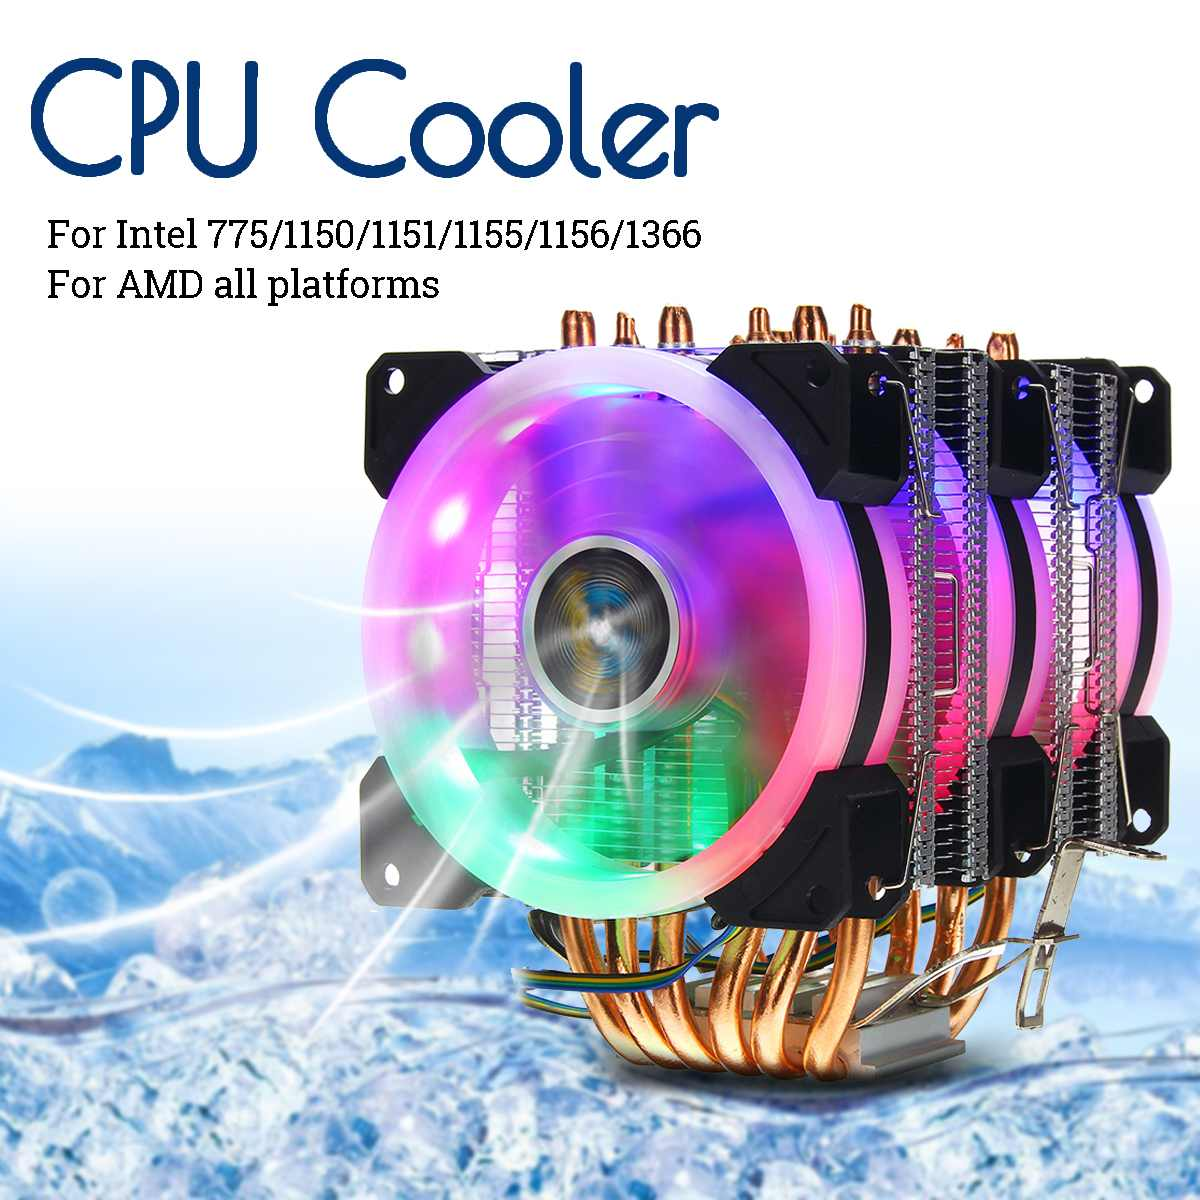 CPU Cooler 6 Heatpipe RGB LED Fan Quiet 4pin CPU Fan Cooling Heatsink CPU Cooling for Intel 775/1150/1151/1155/1156/1366 for AMDCPU Cooler 6 Heatpipe RGB LED Fan Quiet 4pin CPU Fan Cooling Heatsink CPU Cooling for Intel 775/1150/1151/1155/1156/1366 for AMD